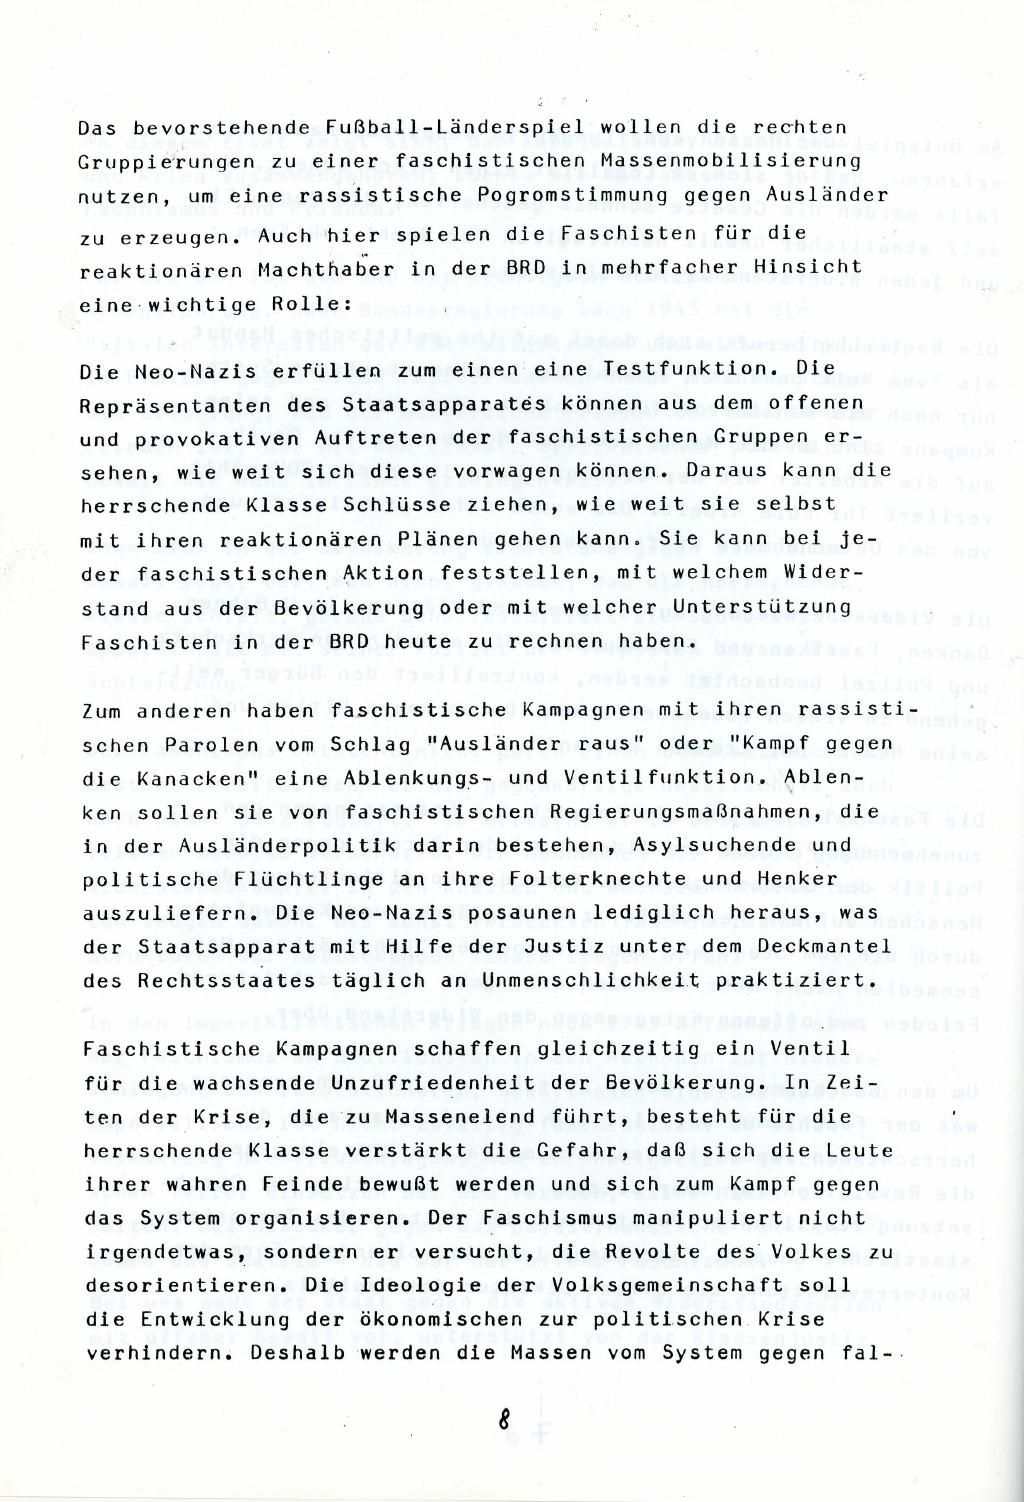 Berlin_1983_Autonome_Gruppen_Faschismus_im_Kapitalismus_08